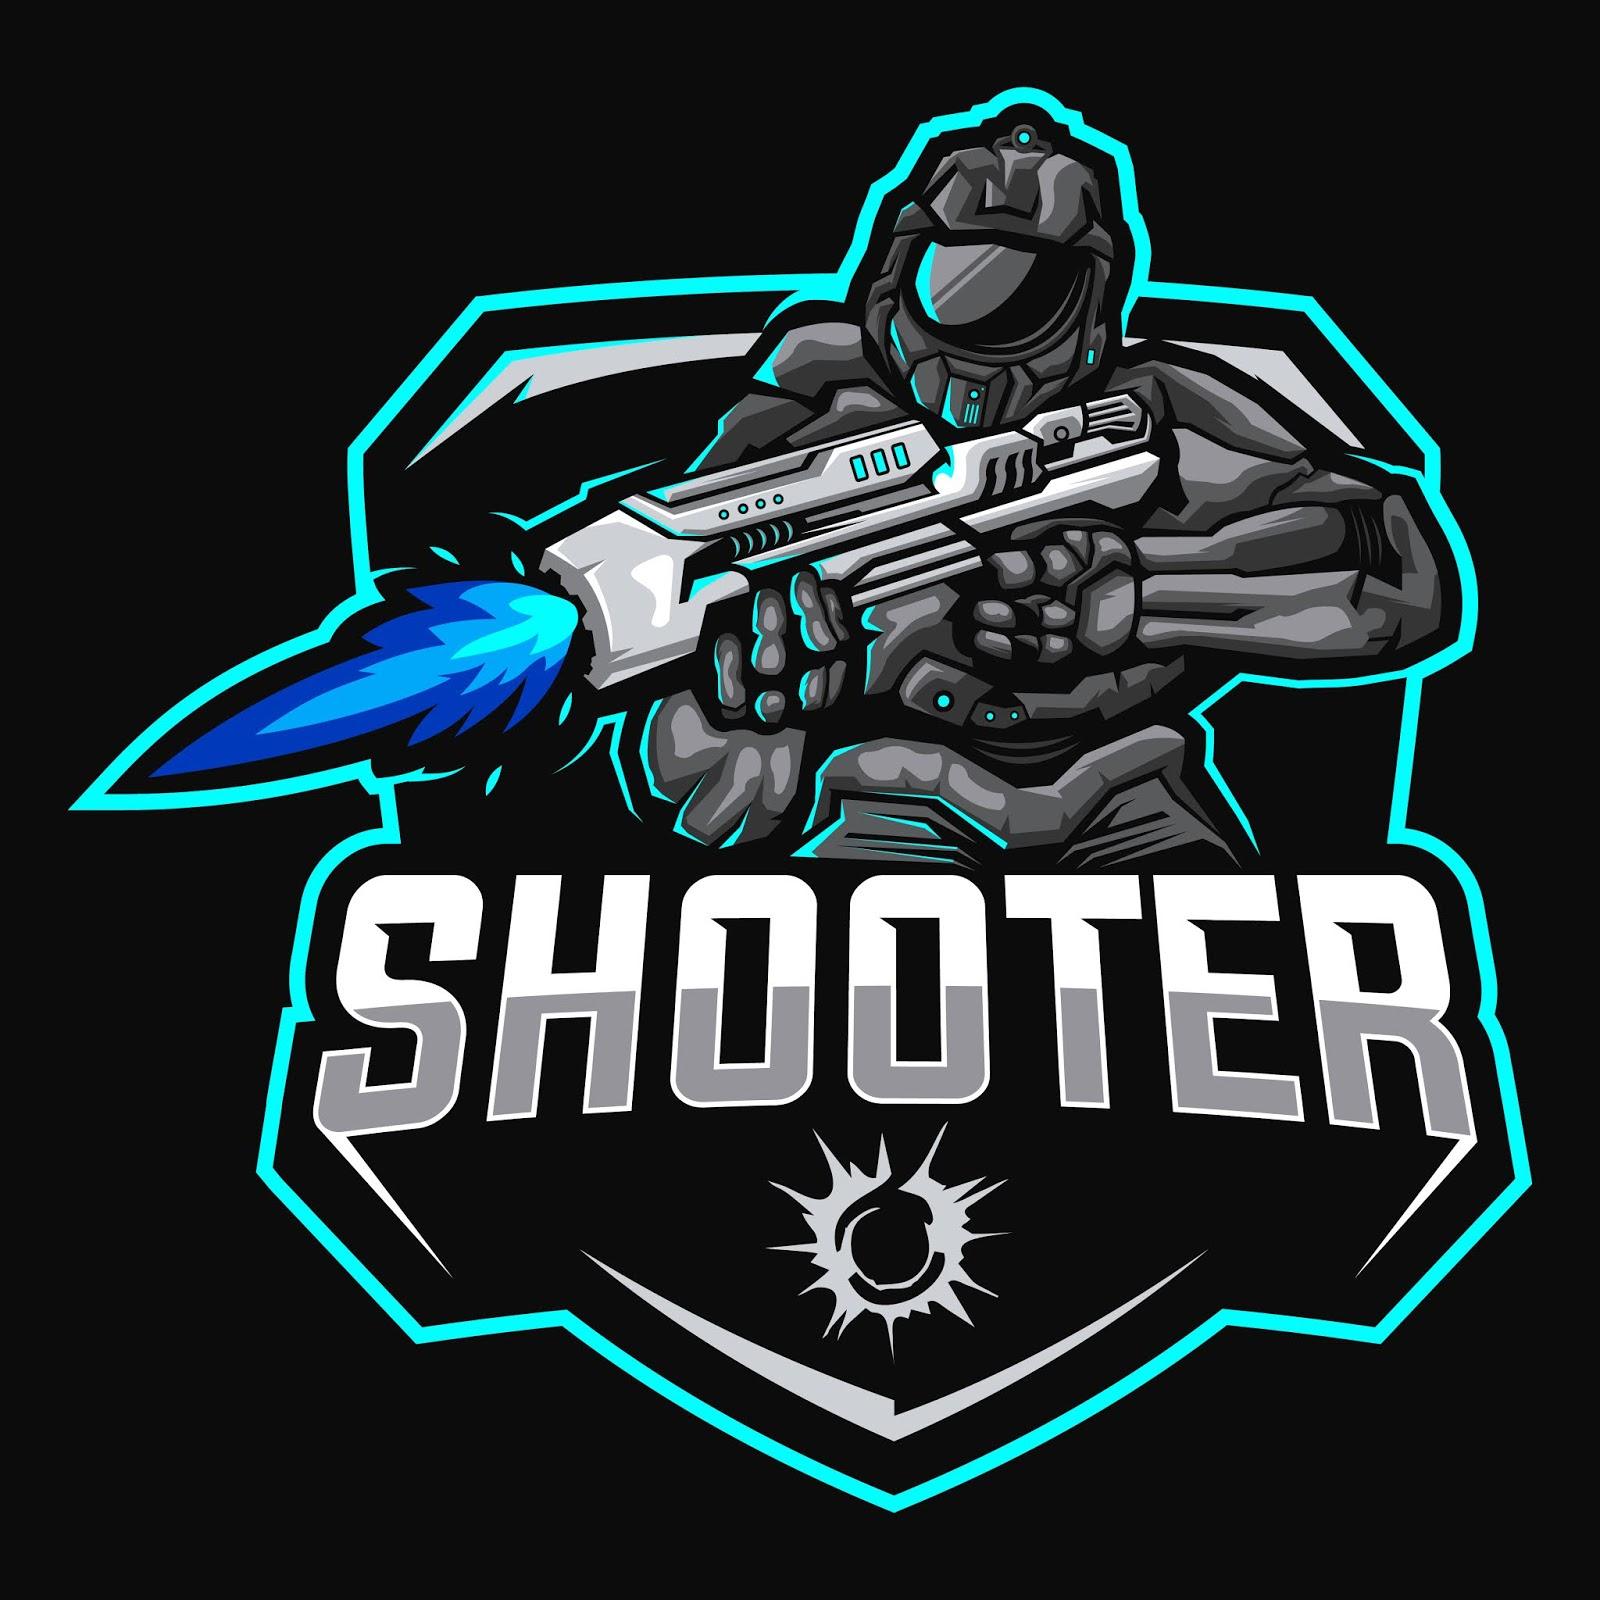 Robots Shooter Mascot Esport Logo Free Download Vector CDR, AI, EPS and PNG Formats